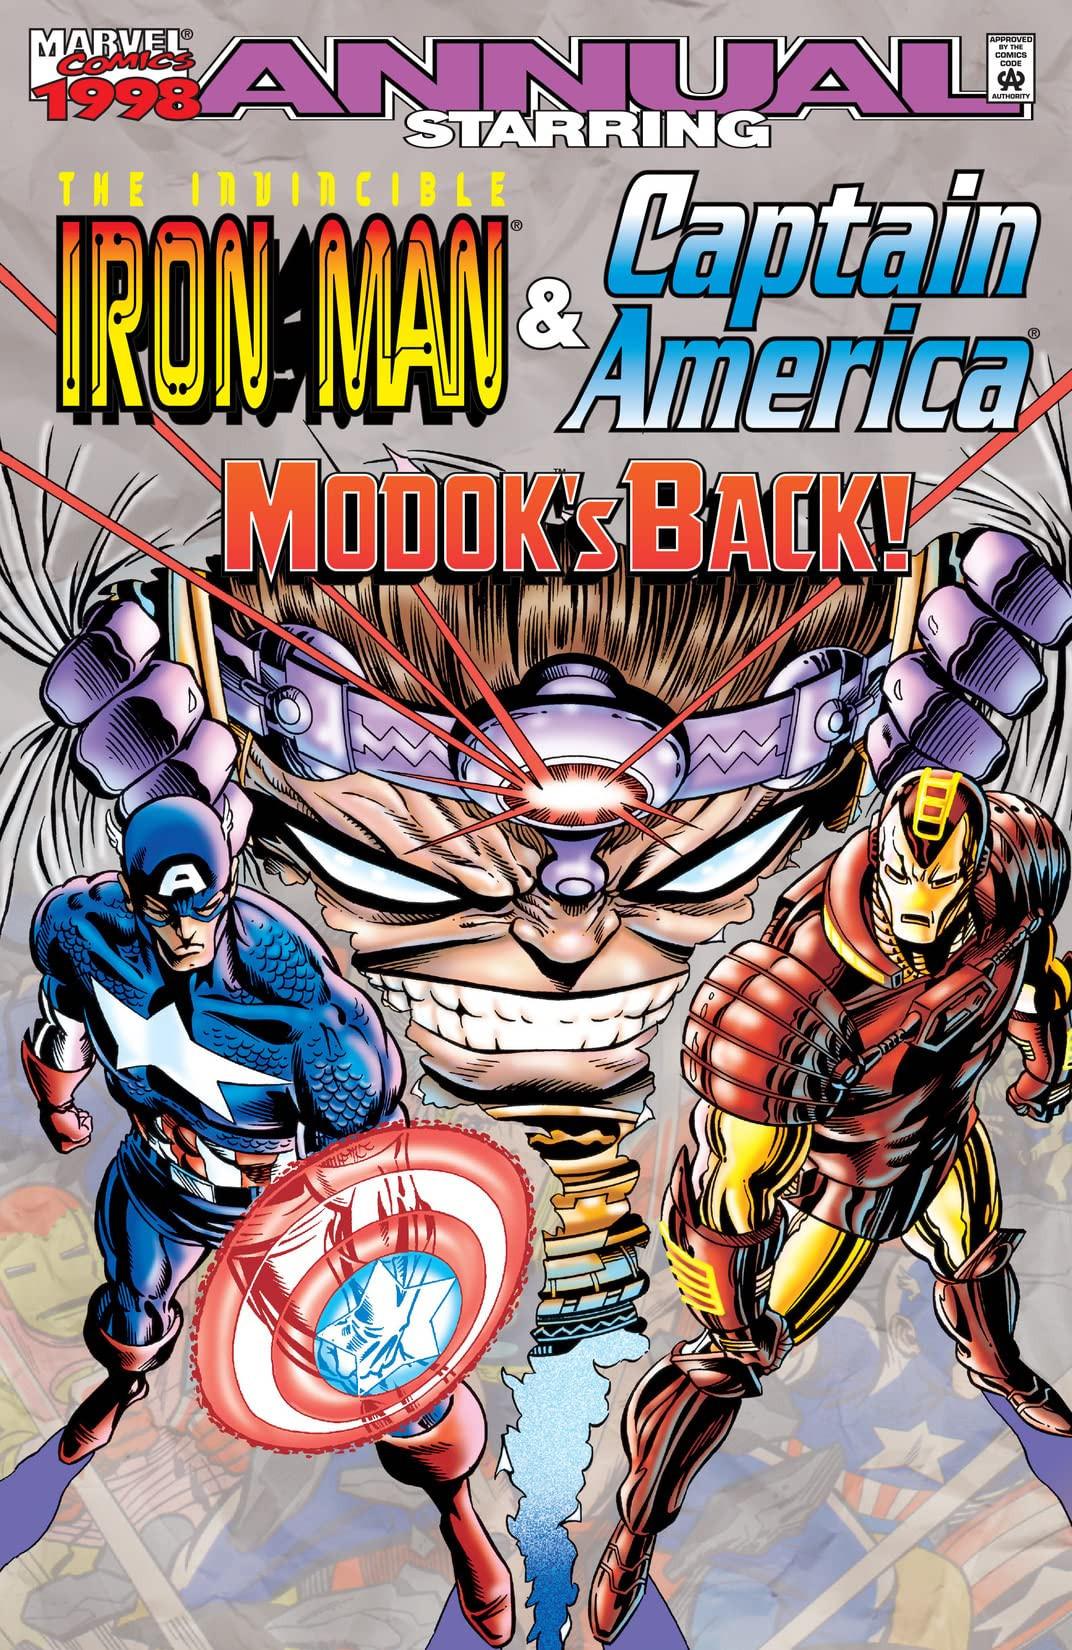 Iron Man & Captain America Vol 1 1998.jpg